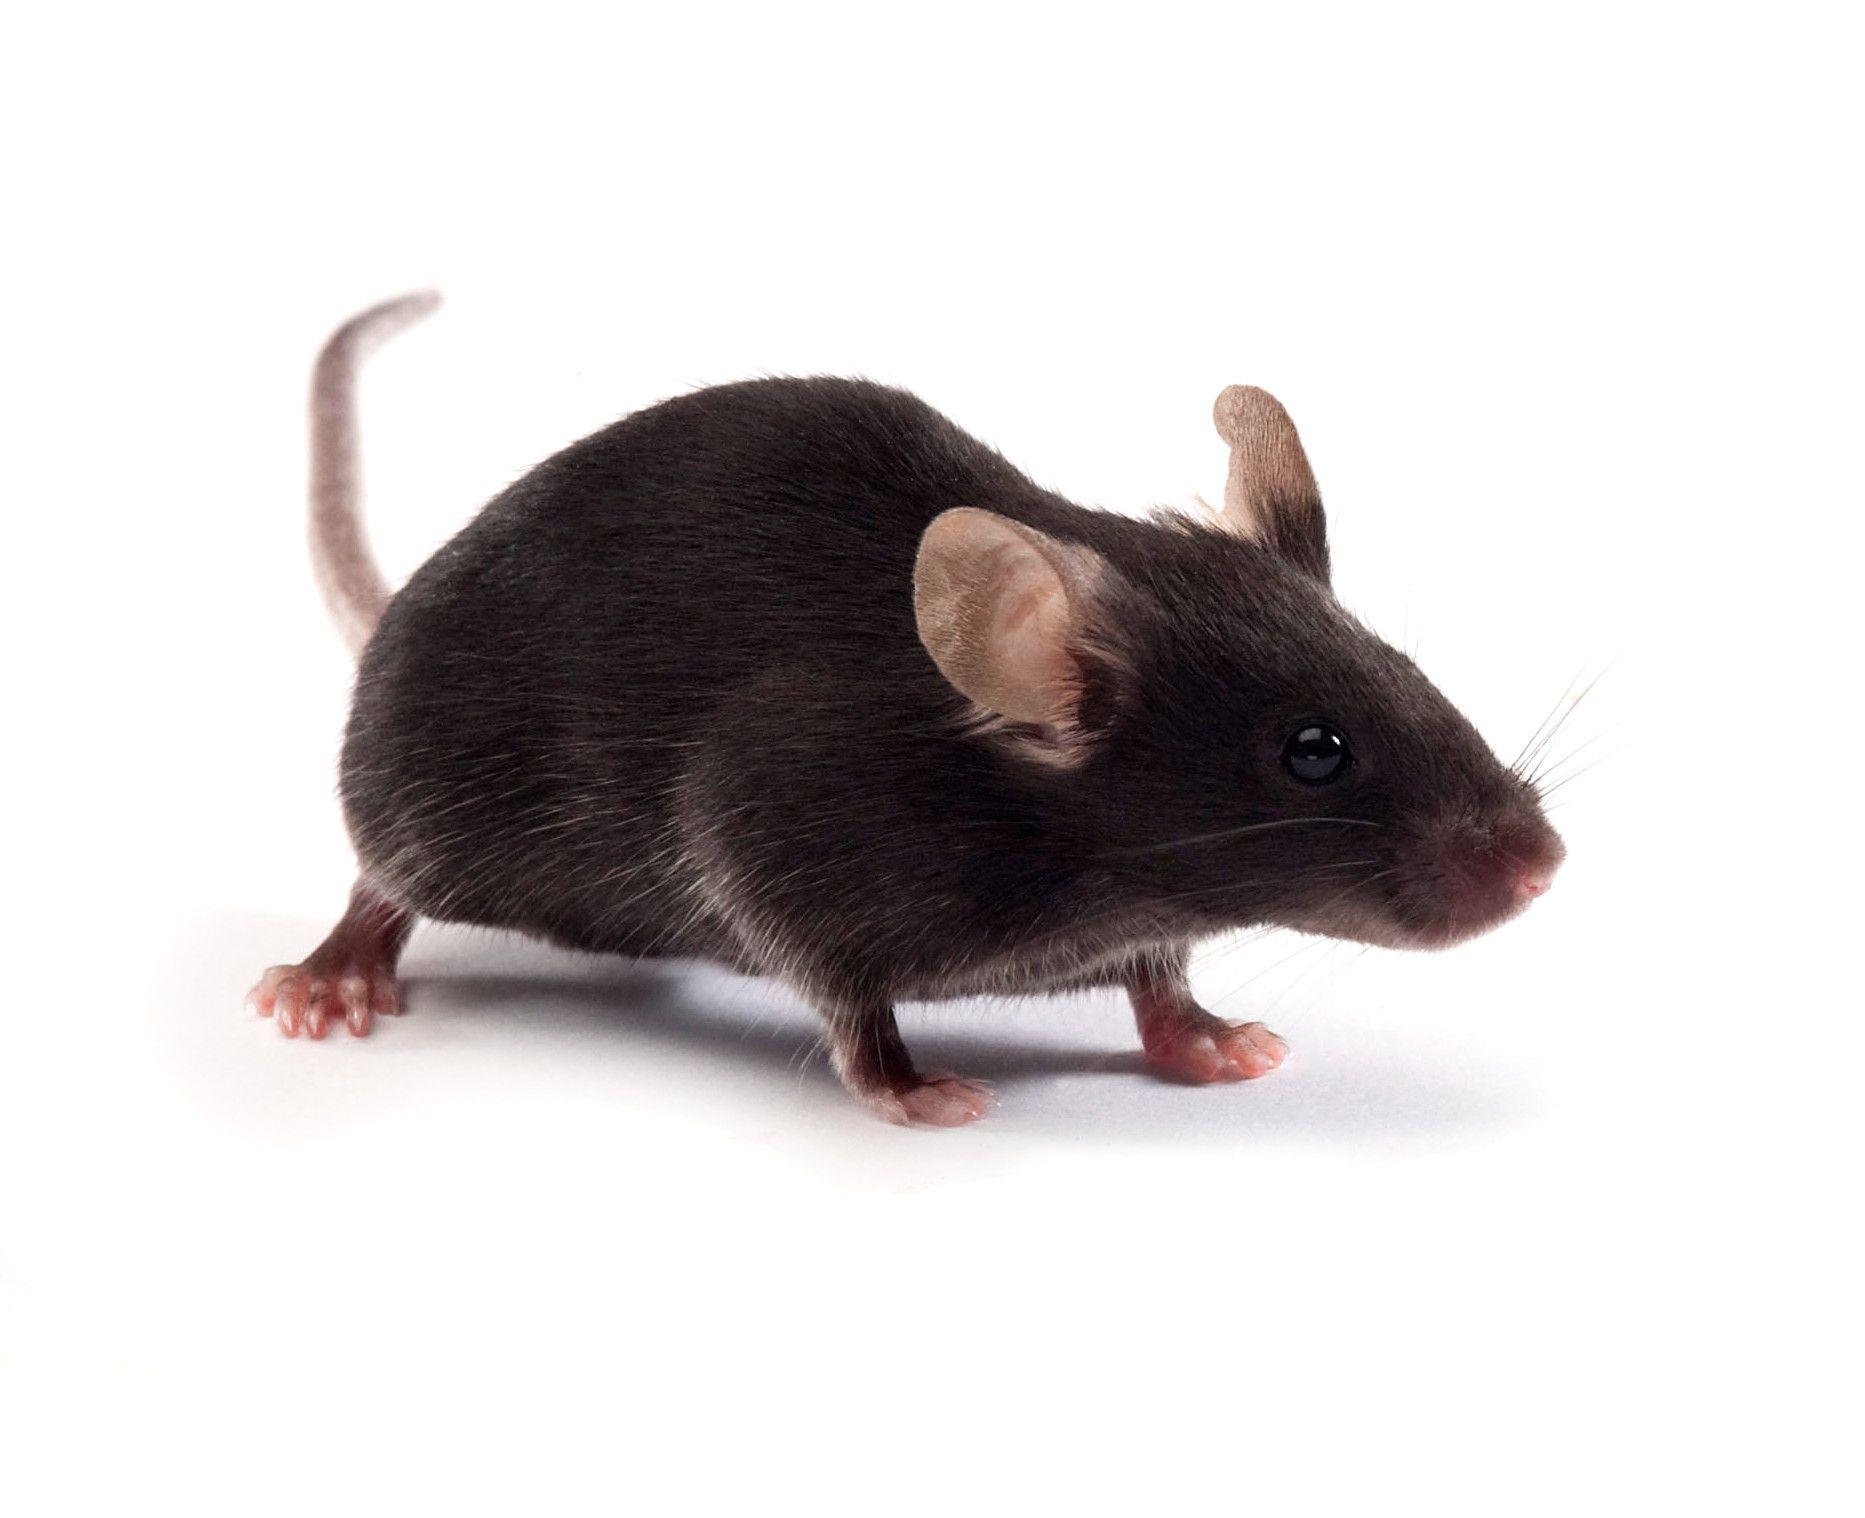 off-the-shelf transgenic mouse